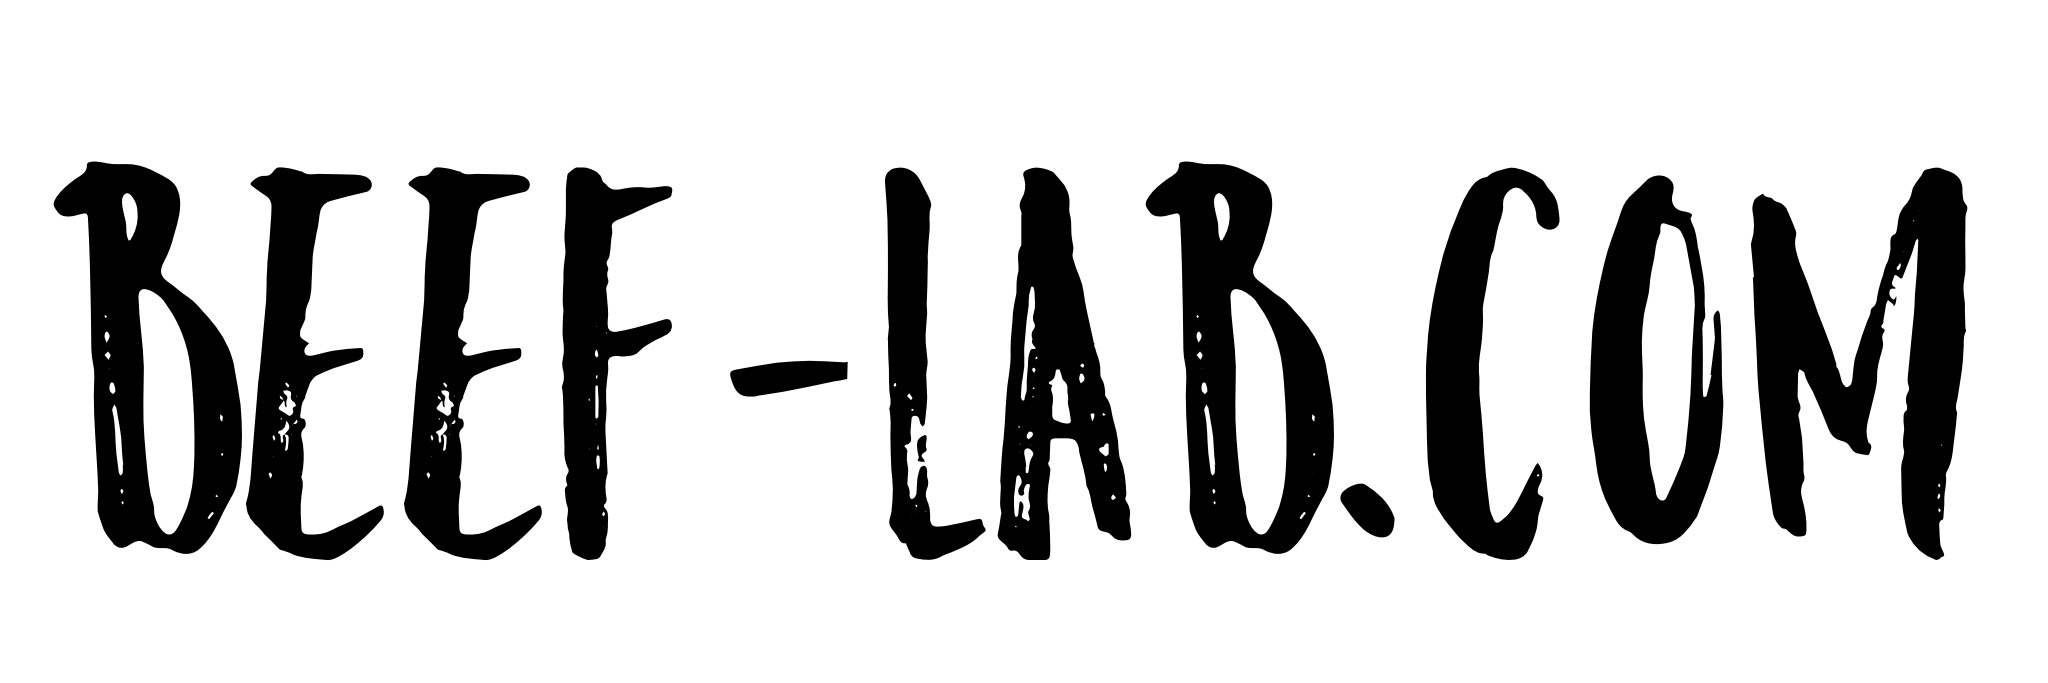 BEEF-LAB.com